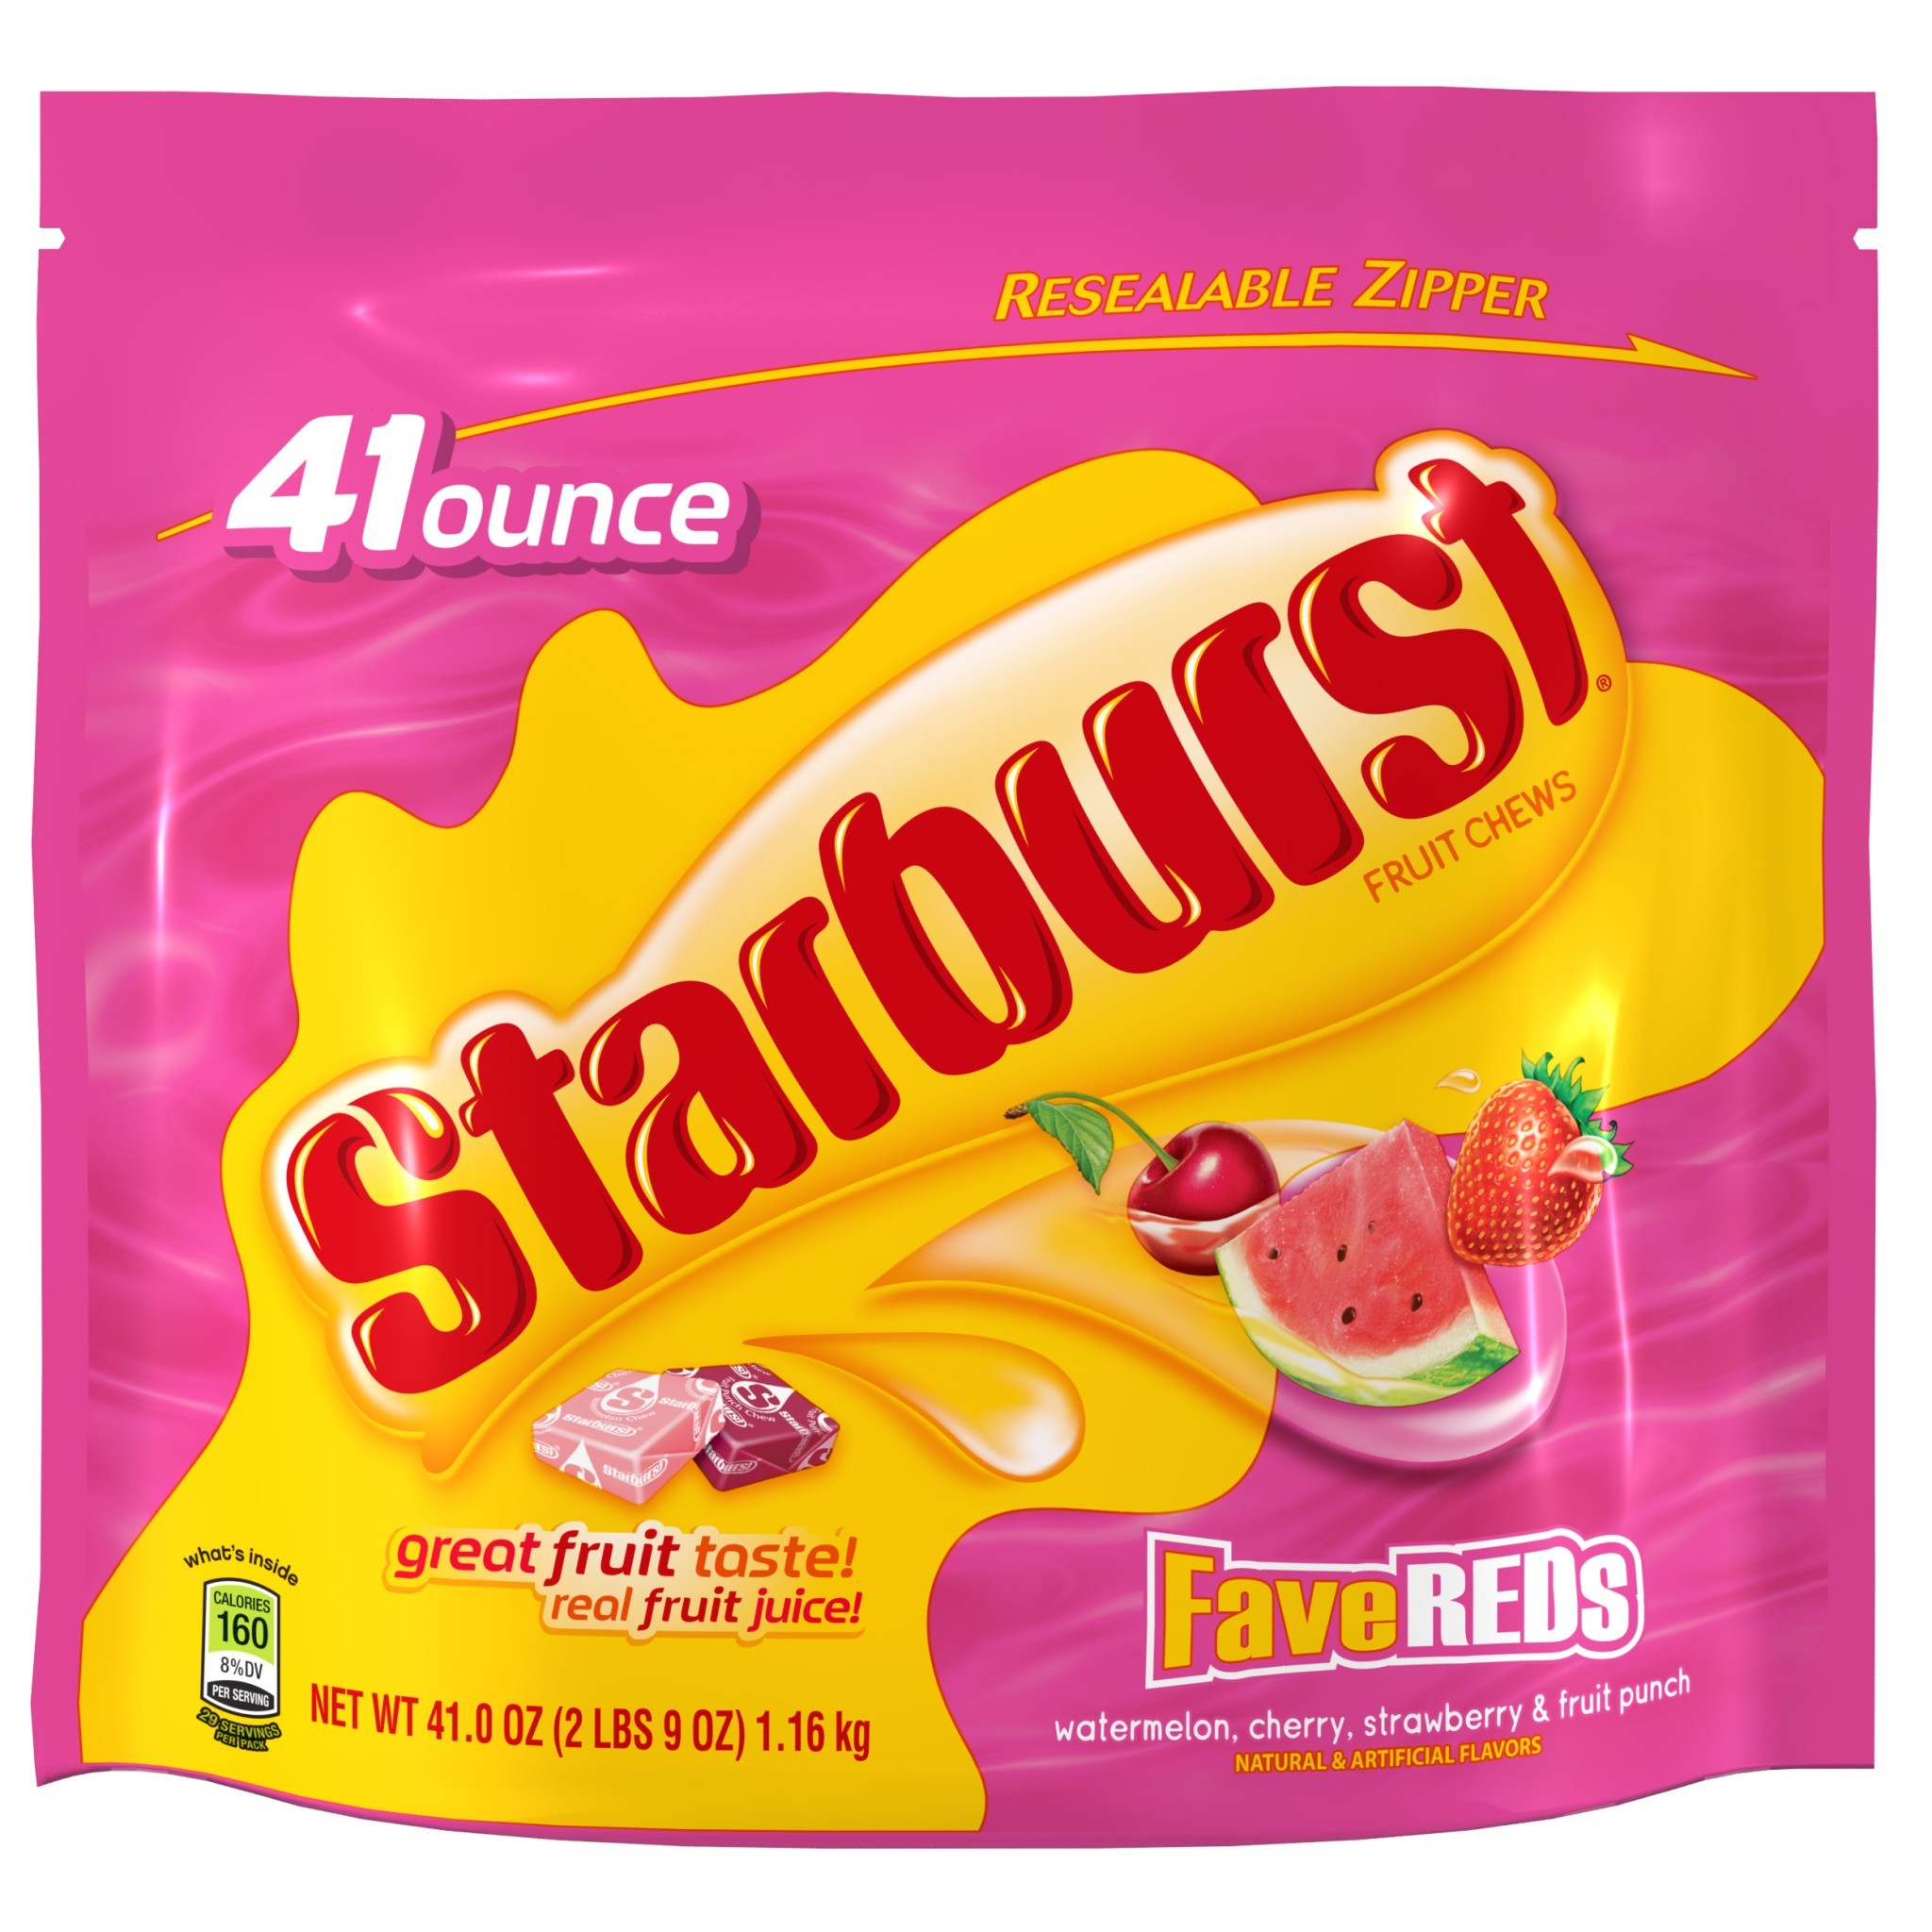 Starburst FaveREDS Fruit Chews Candy, 41 Oz.